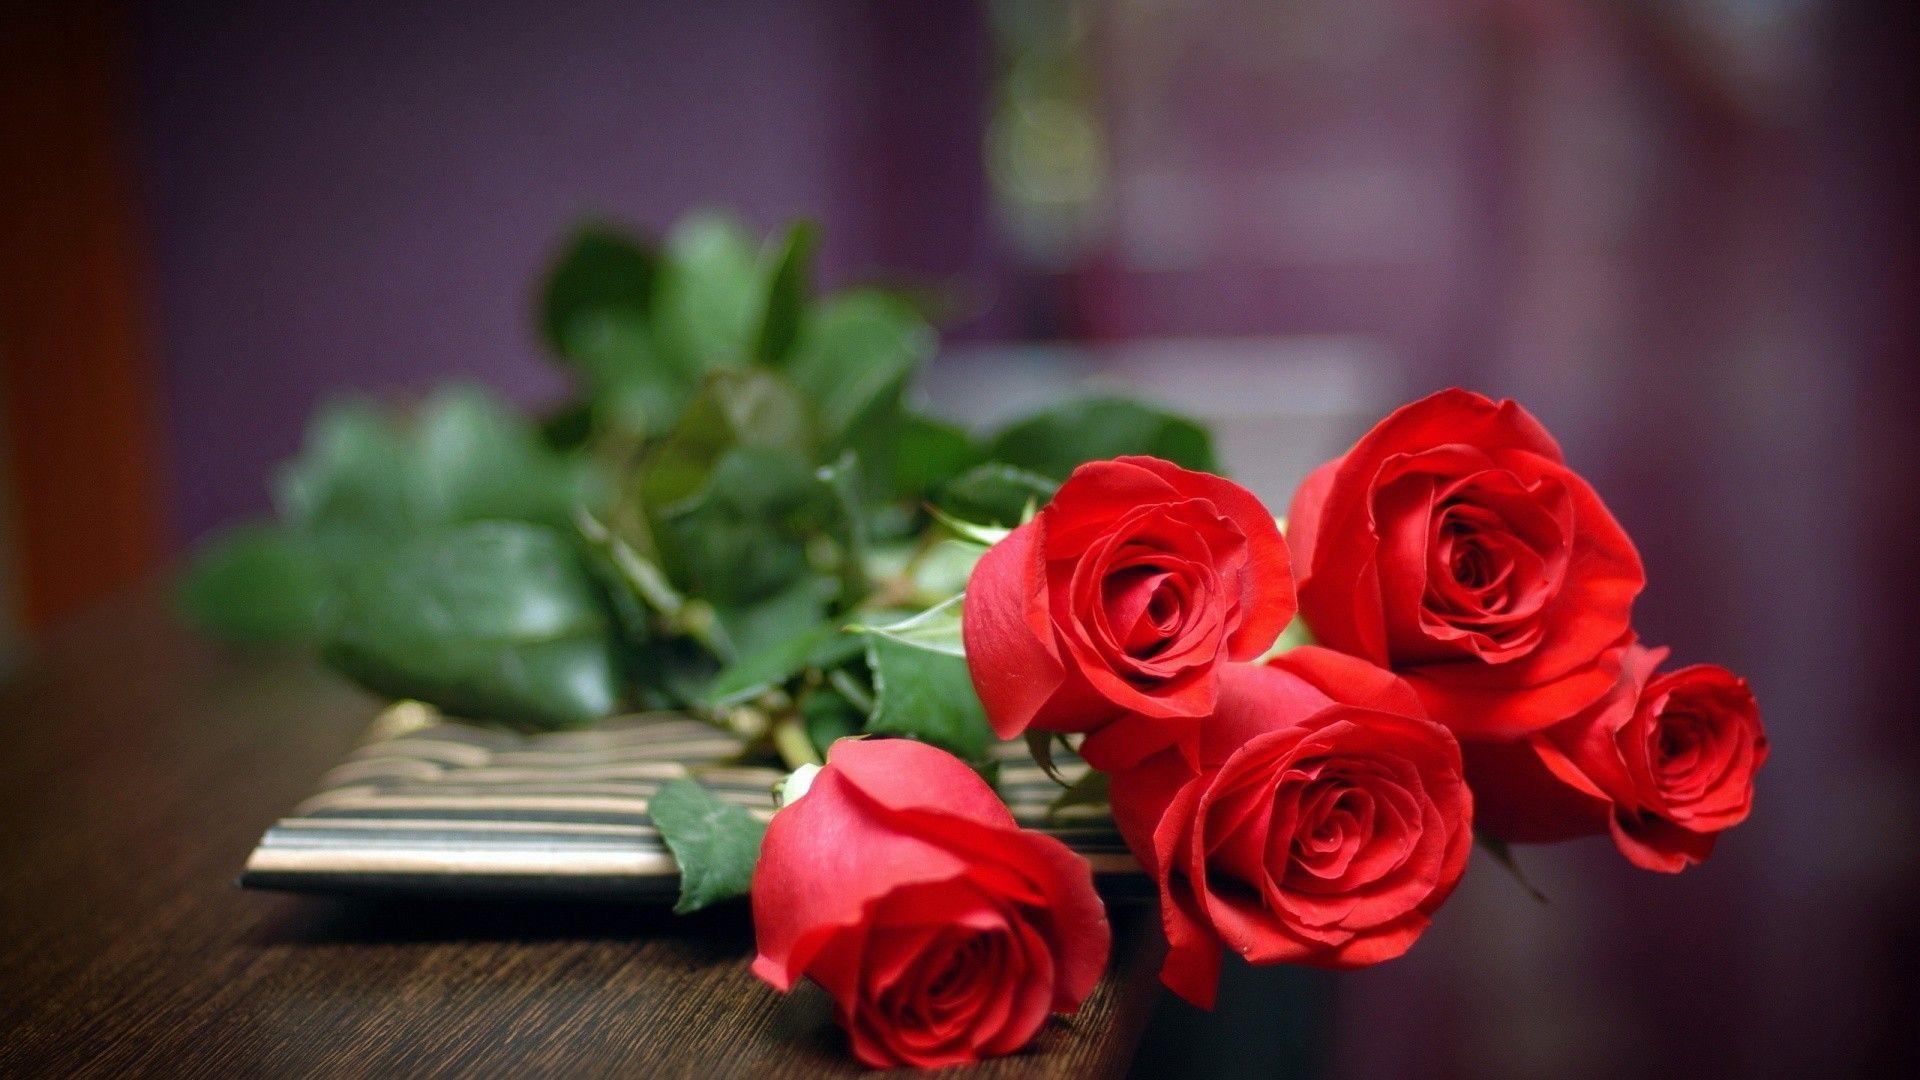 Hd Rose Images Find Best Latest Hd Rose Images In Hd For Your Pc Desktop Background Amp Mobile Phon Rose Flower Wallpaper Rose Flower Photos Rose Flower Hd